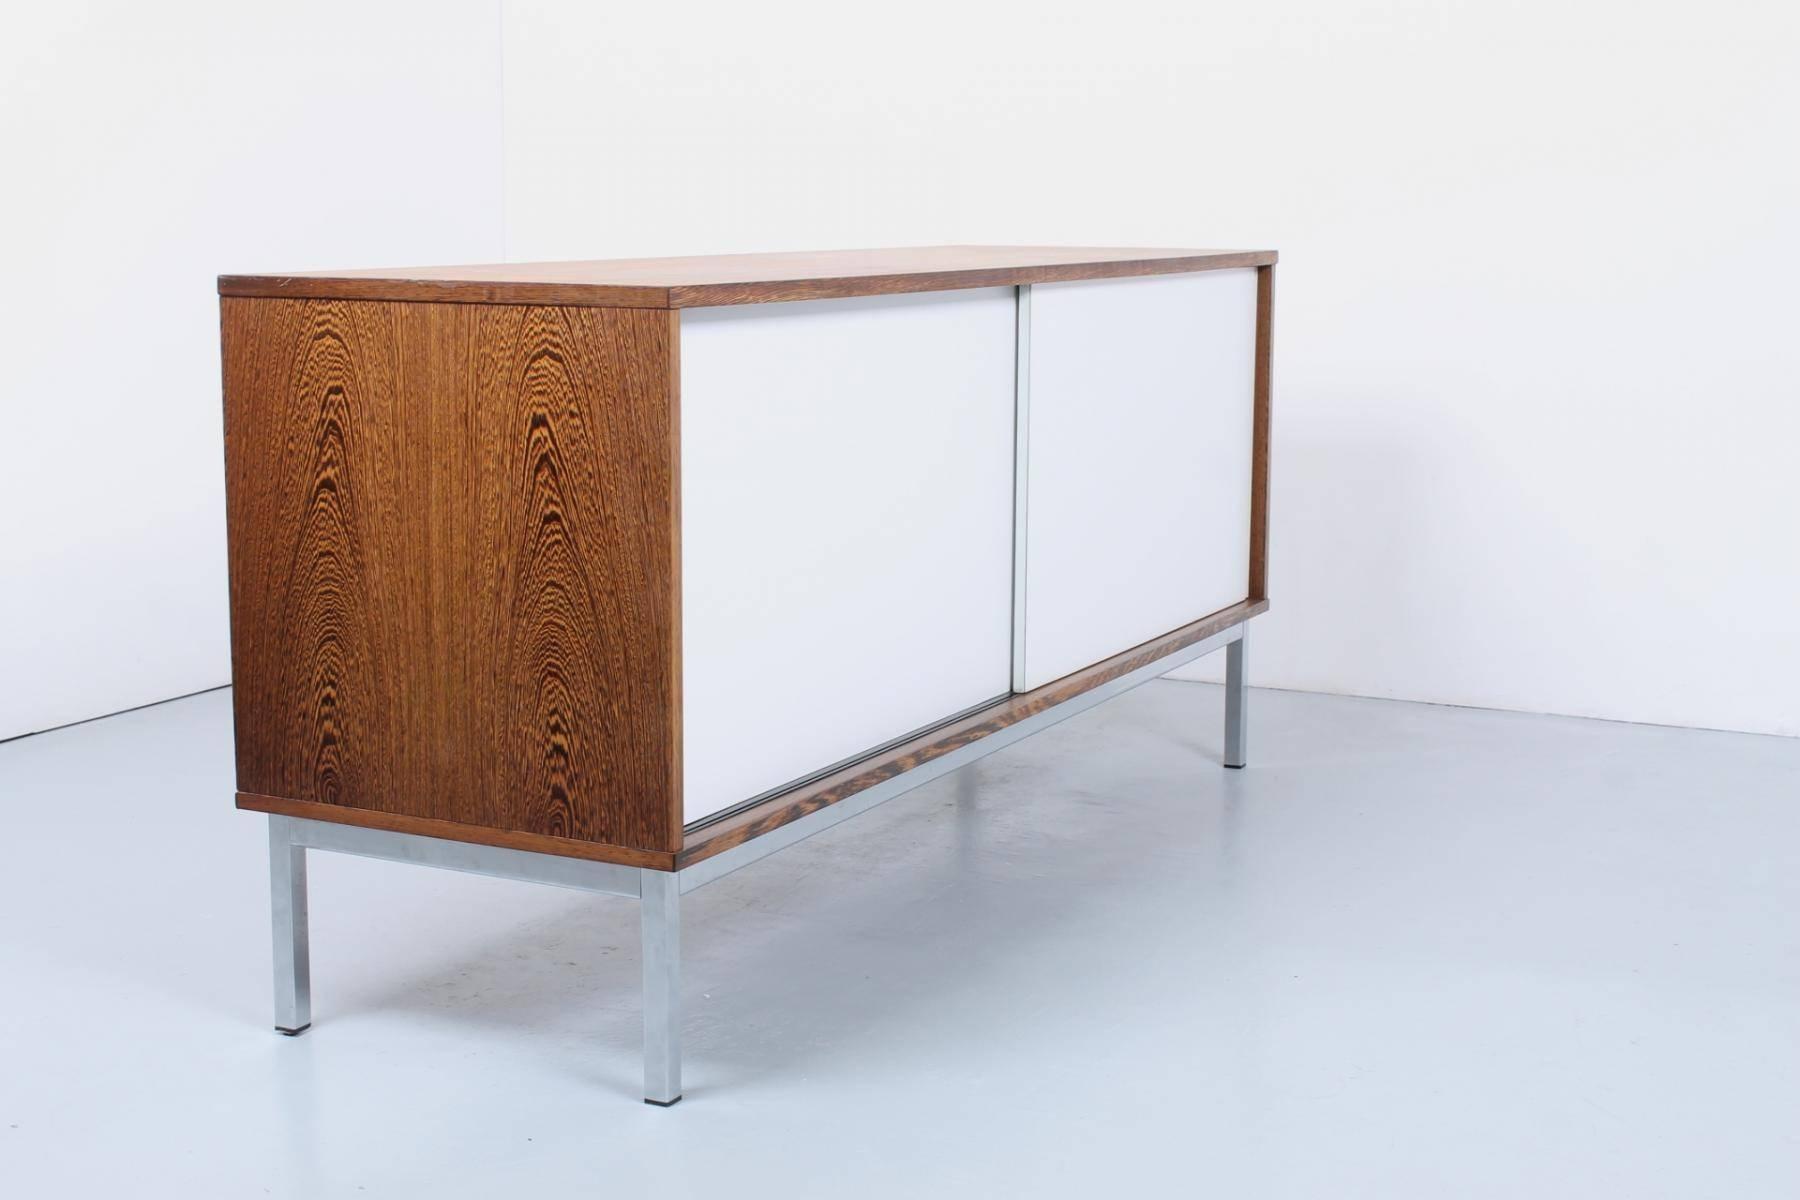 Vintage Kw 87 Sideboard In Wenge Veneer And White Formica inside Wenge Sideboards (Image 14 of 15)